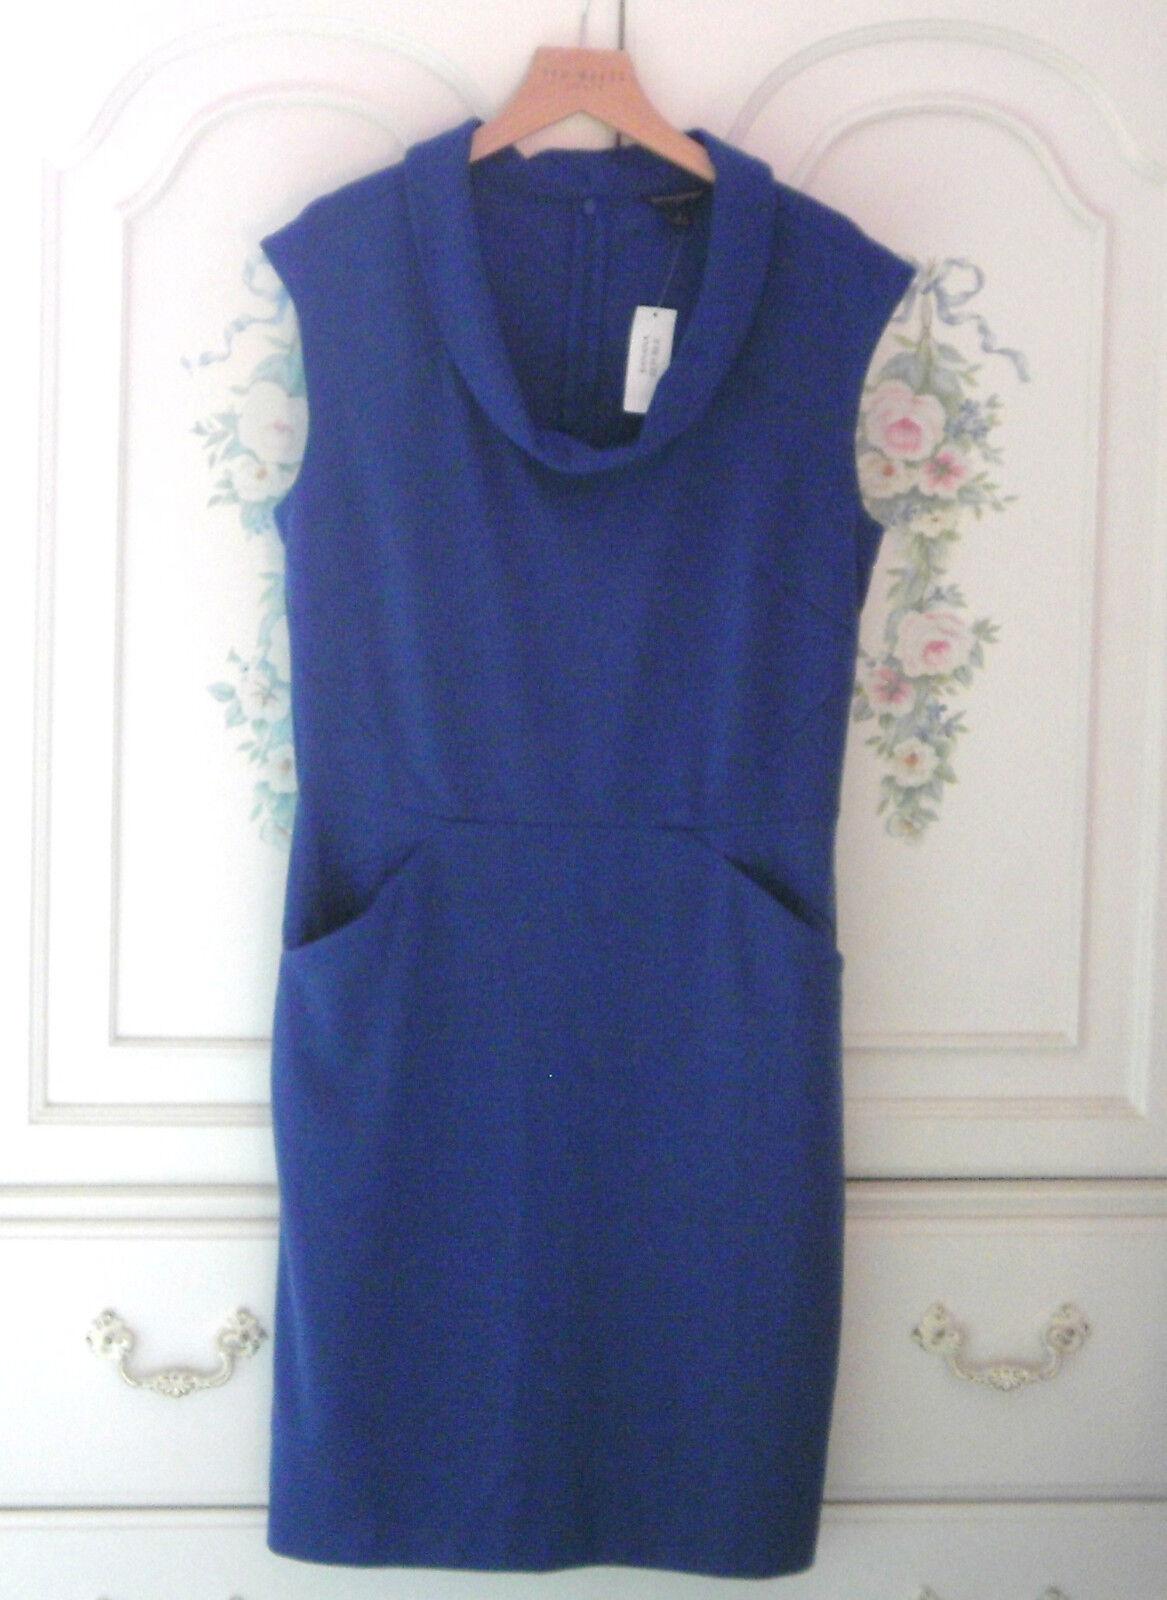 Banana Republic Dress With Pockets NWT Größe 8 Blau Cowl Neckline